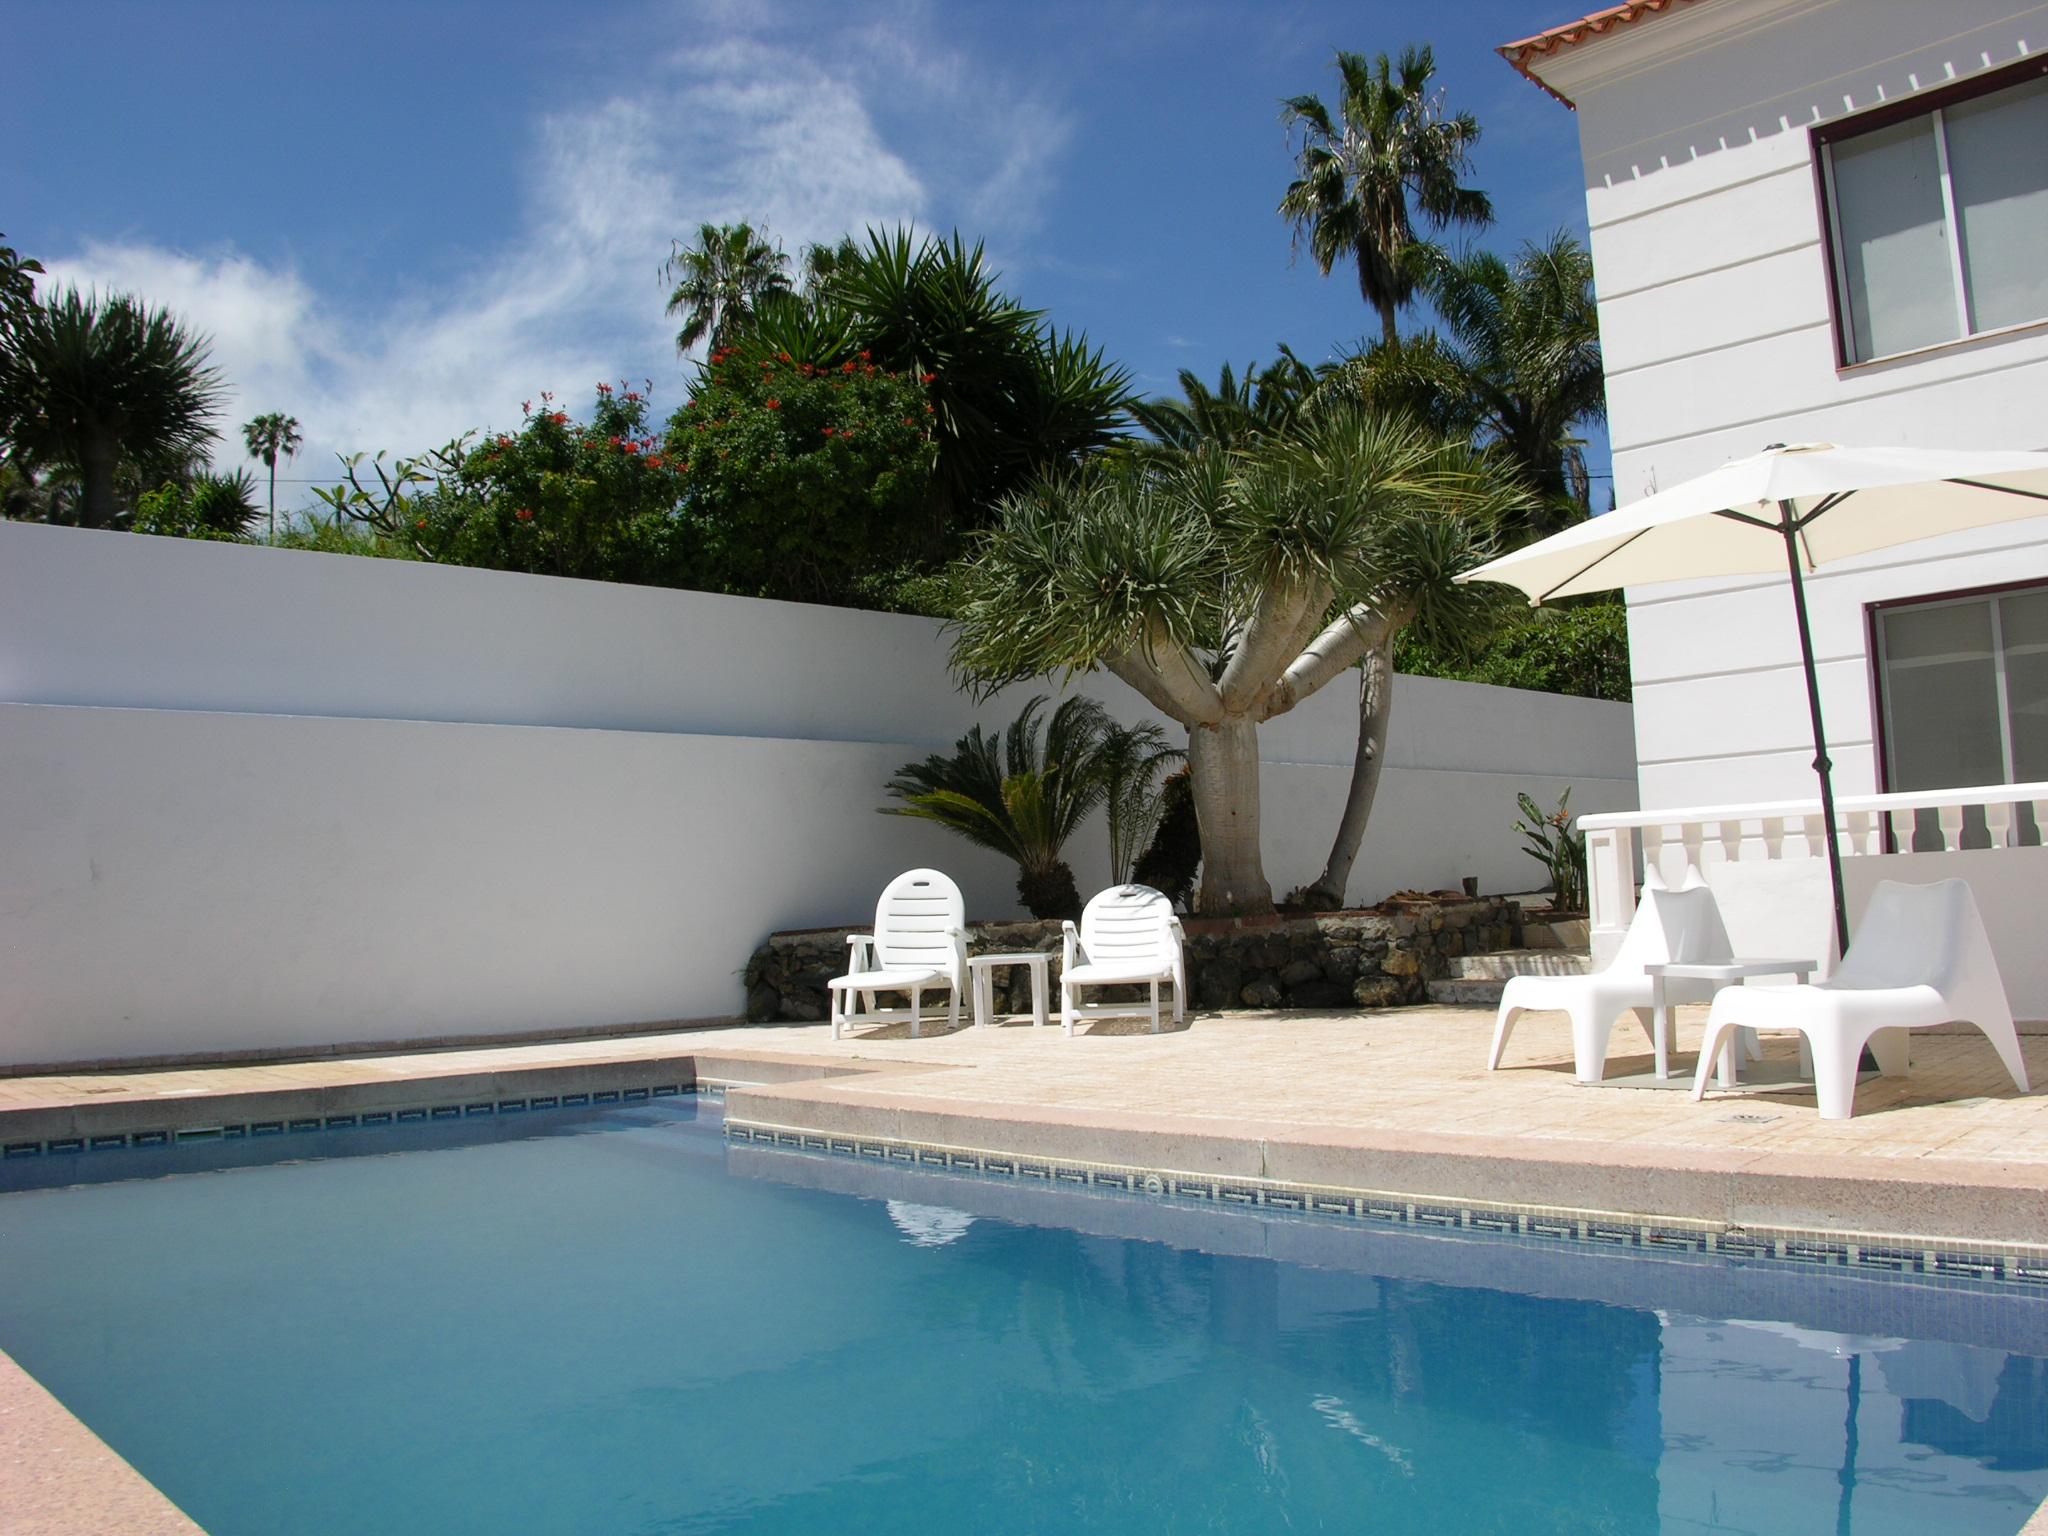 Maison de vacances Villa Vista La Quinta beheizbarer Pool kostenloses WLAN Grill (2124407), Santa Ursula, Ténérife, Iles Canaries, Espagne, image 50